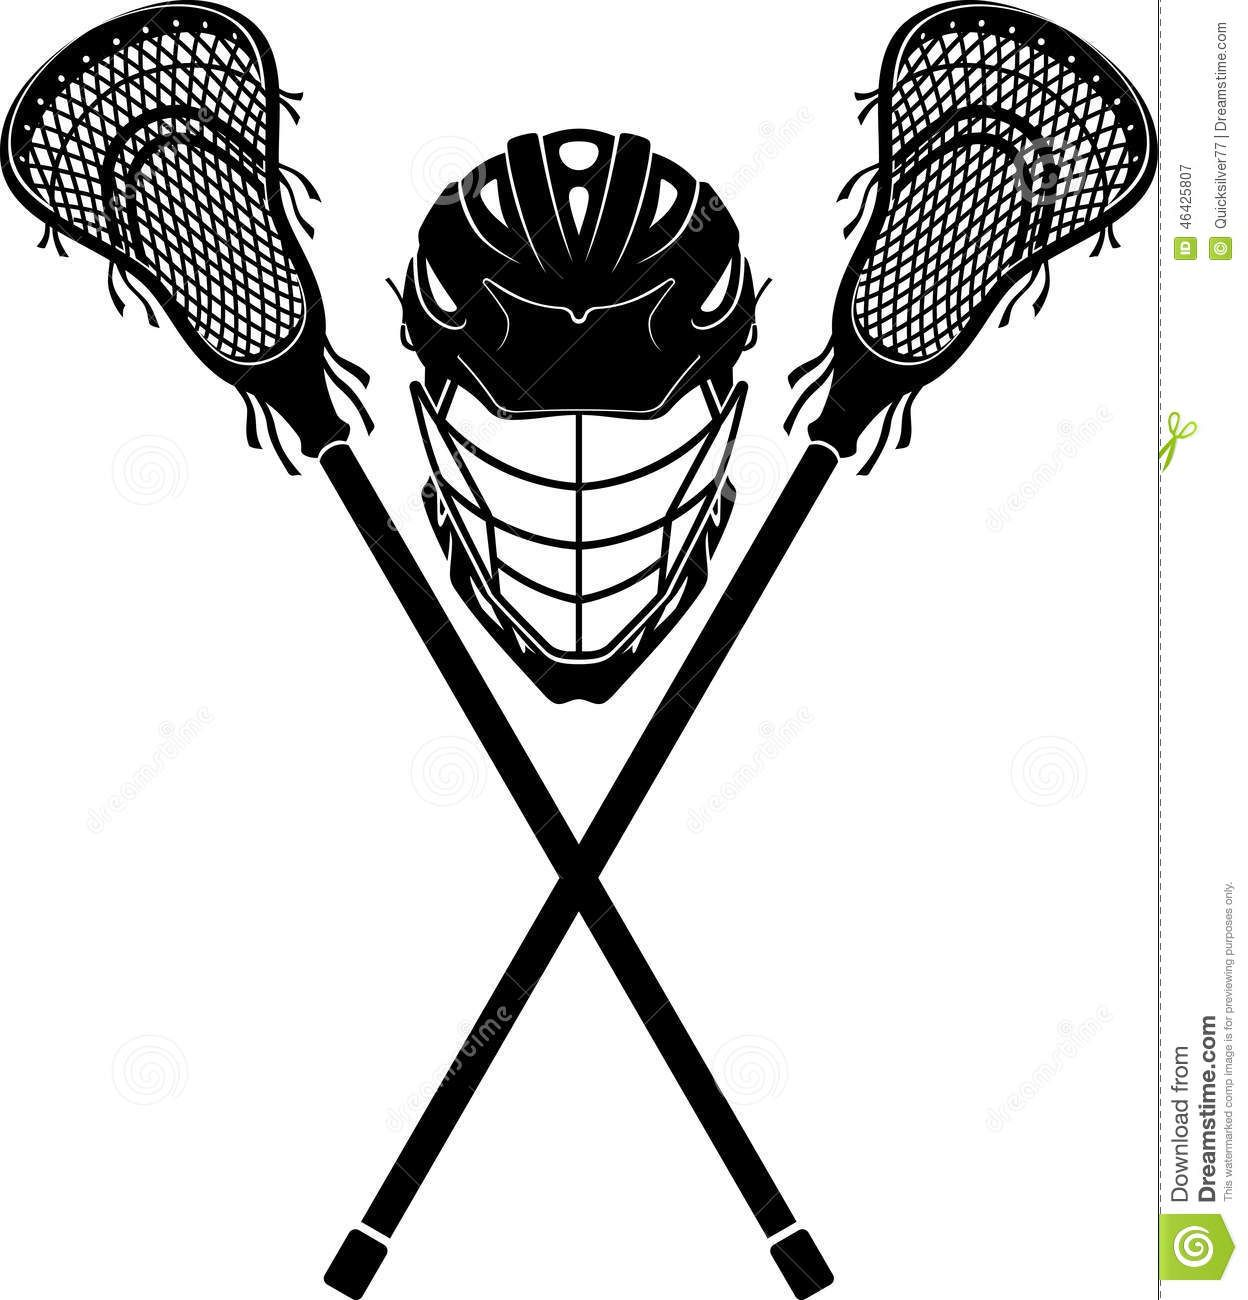 hight resolution of la crosse silhouette clip art silhouette projects lacrosse sport sports equipment